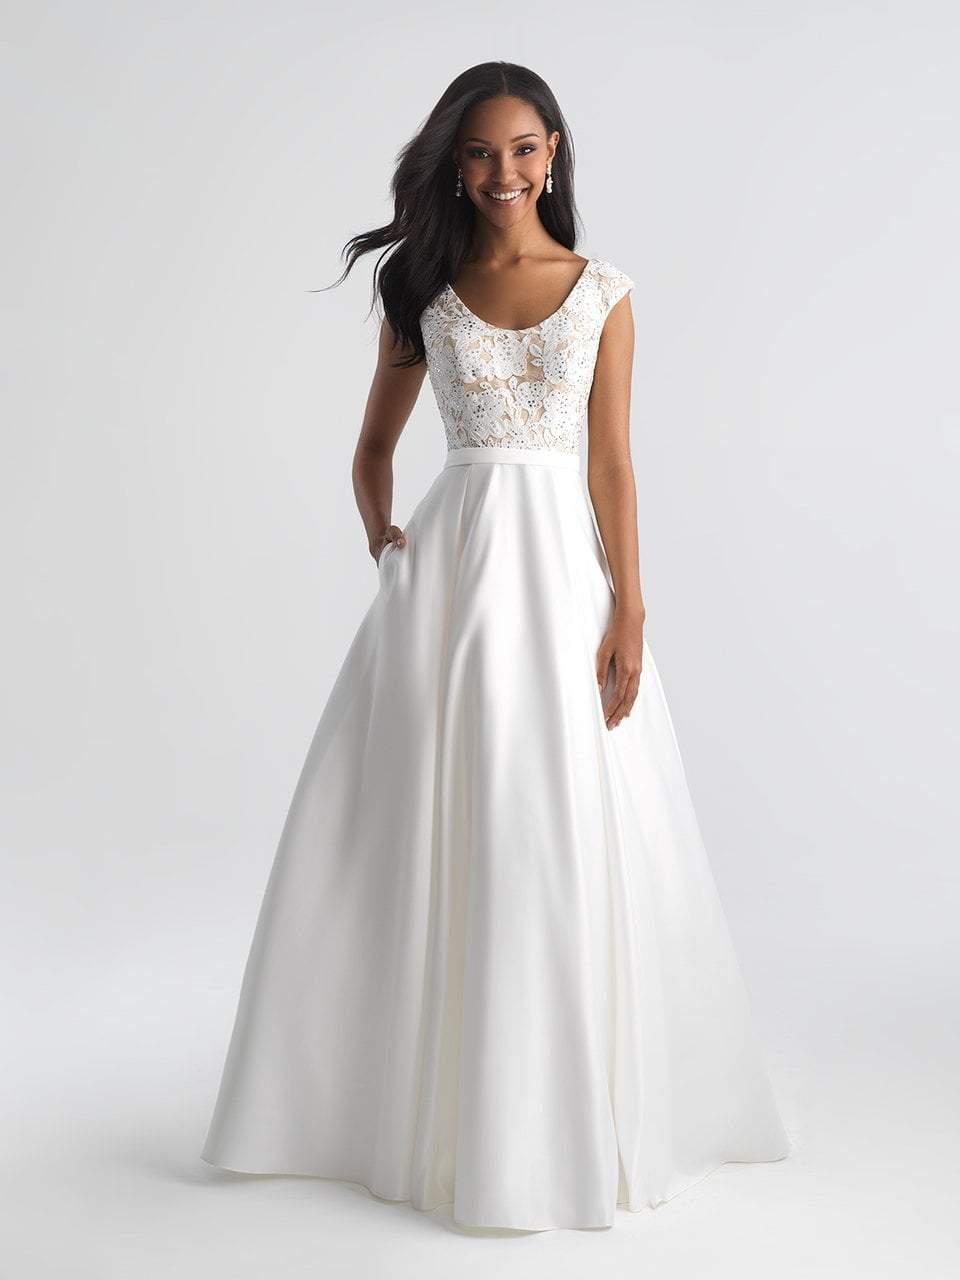 Madison James - 18-654 Beaded Floral Appliqued A-Line Dress